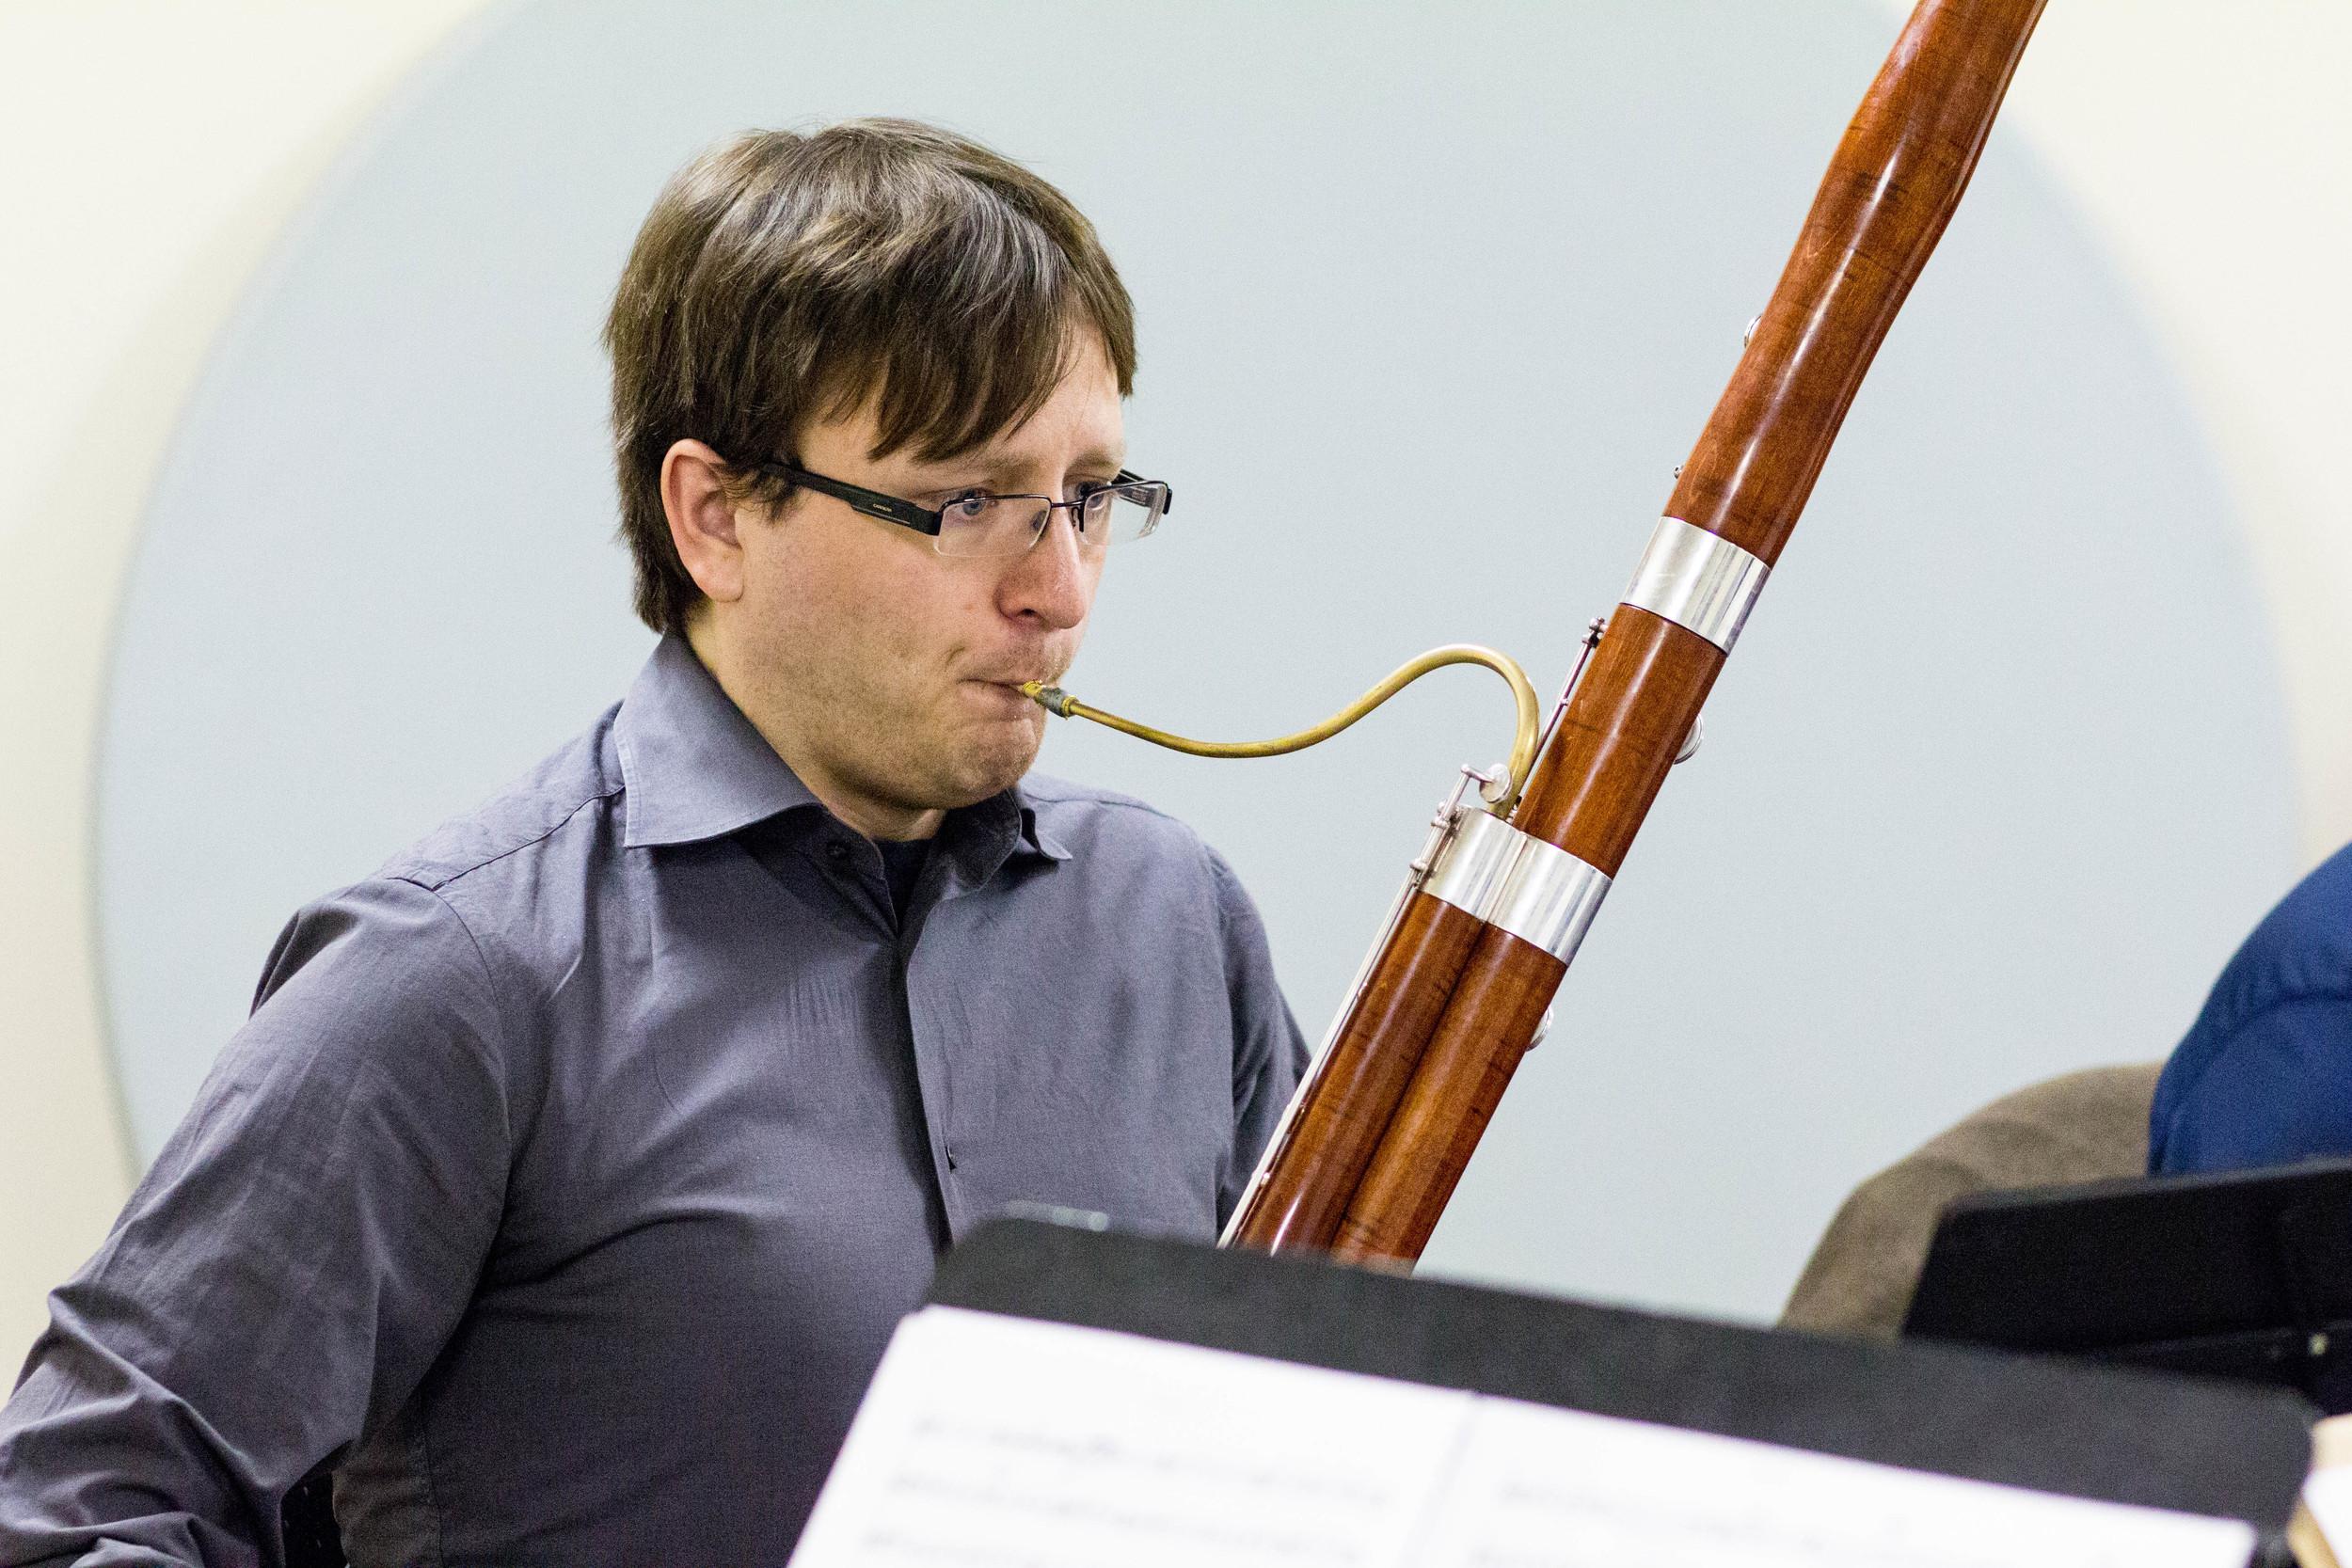 Copy of Michael Macauley (bassoon)